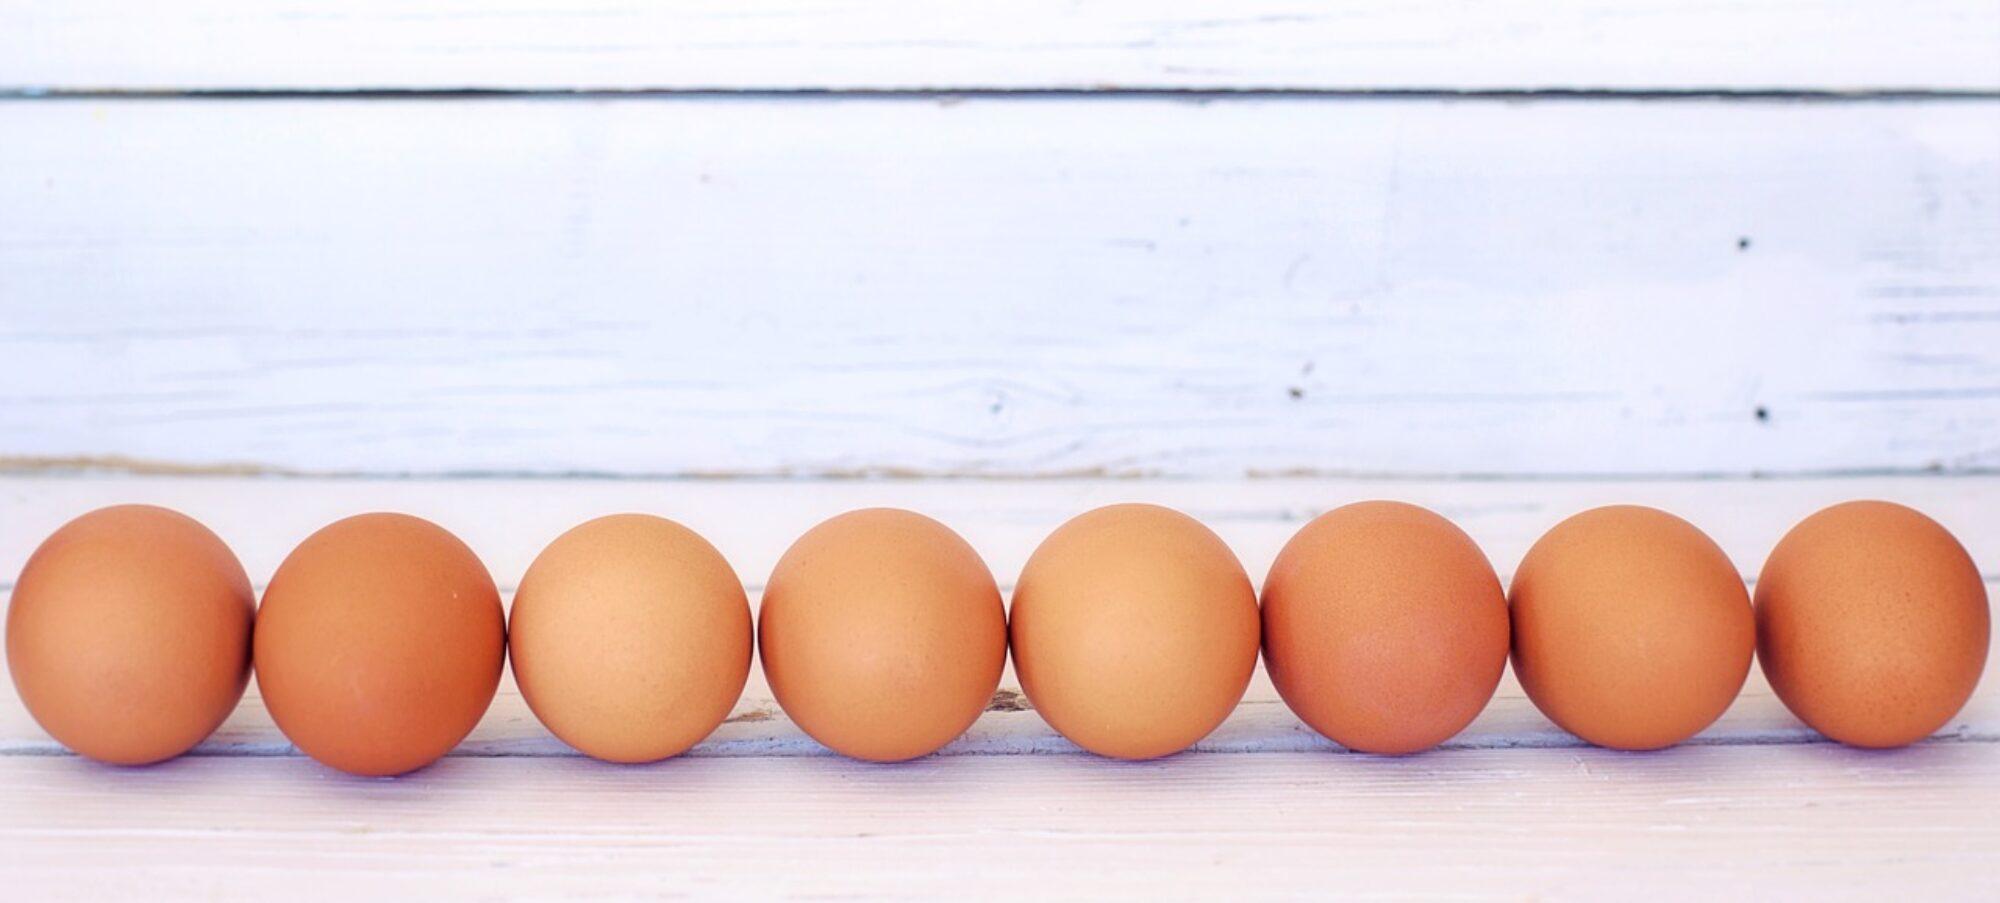 Eierkocher Vergleich